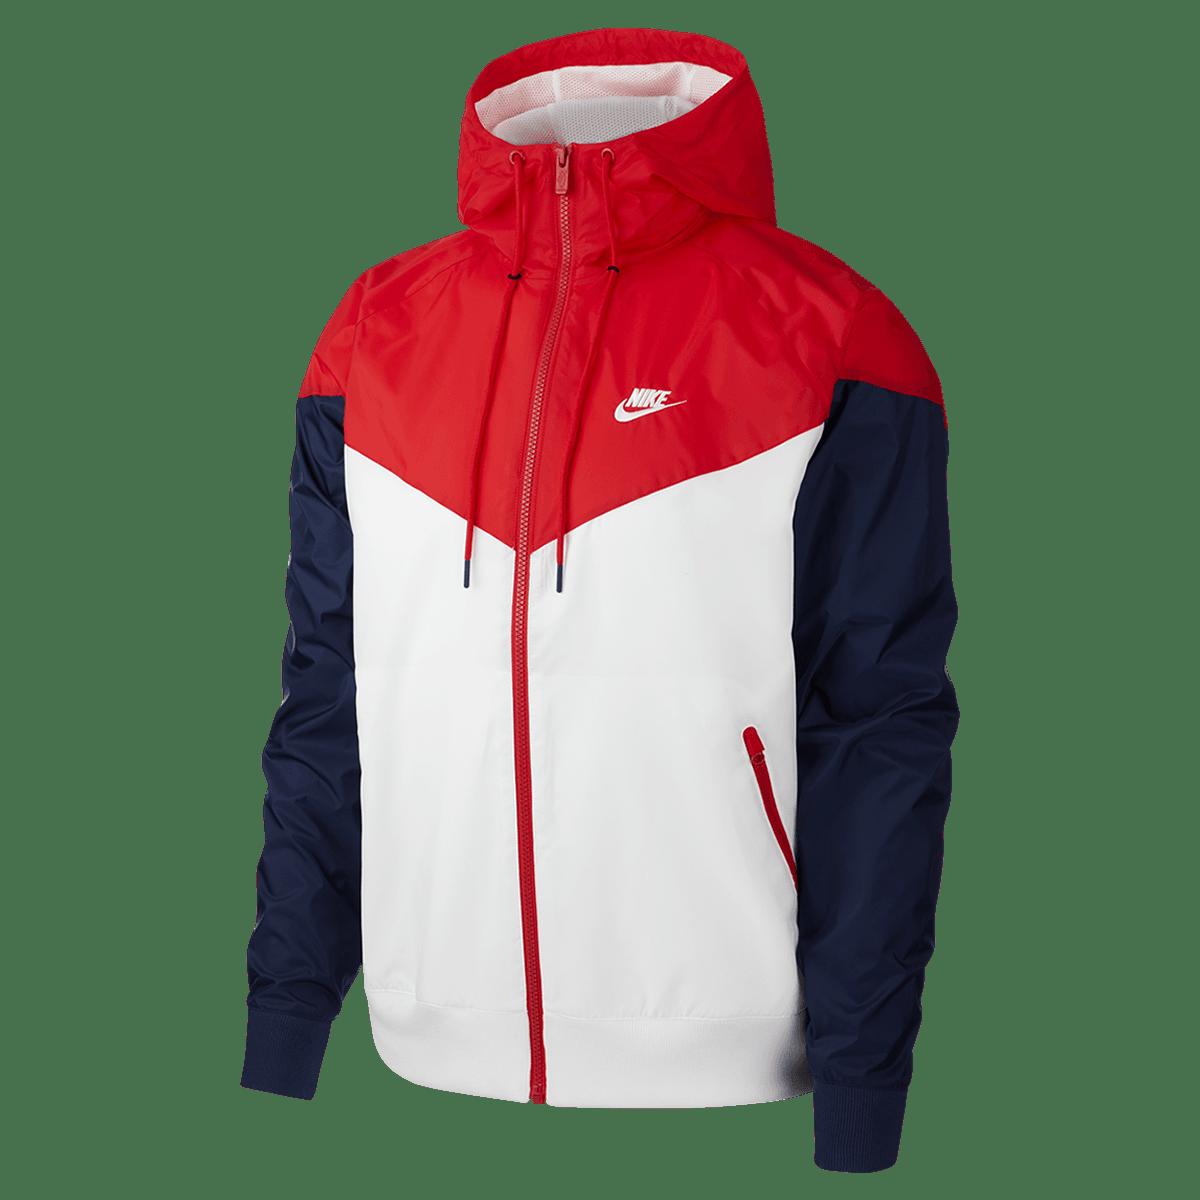 Veste à capuche Nike Sportswear Windrunner blancrouge Boutique football